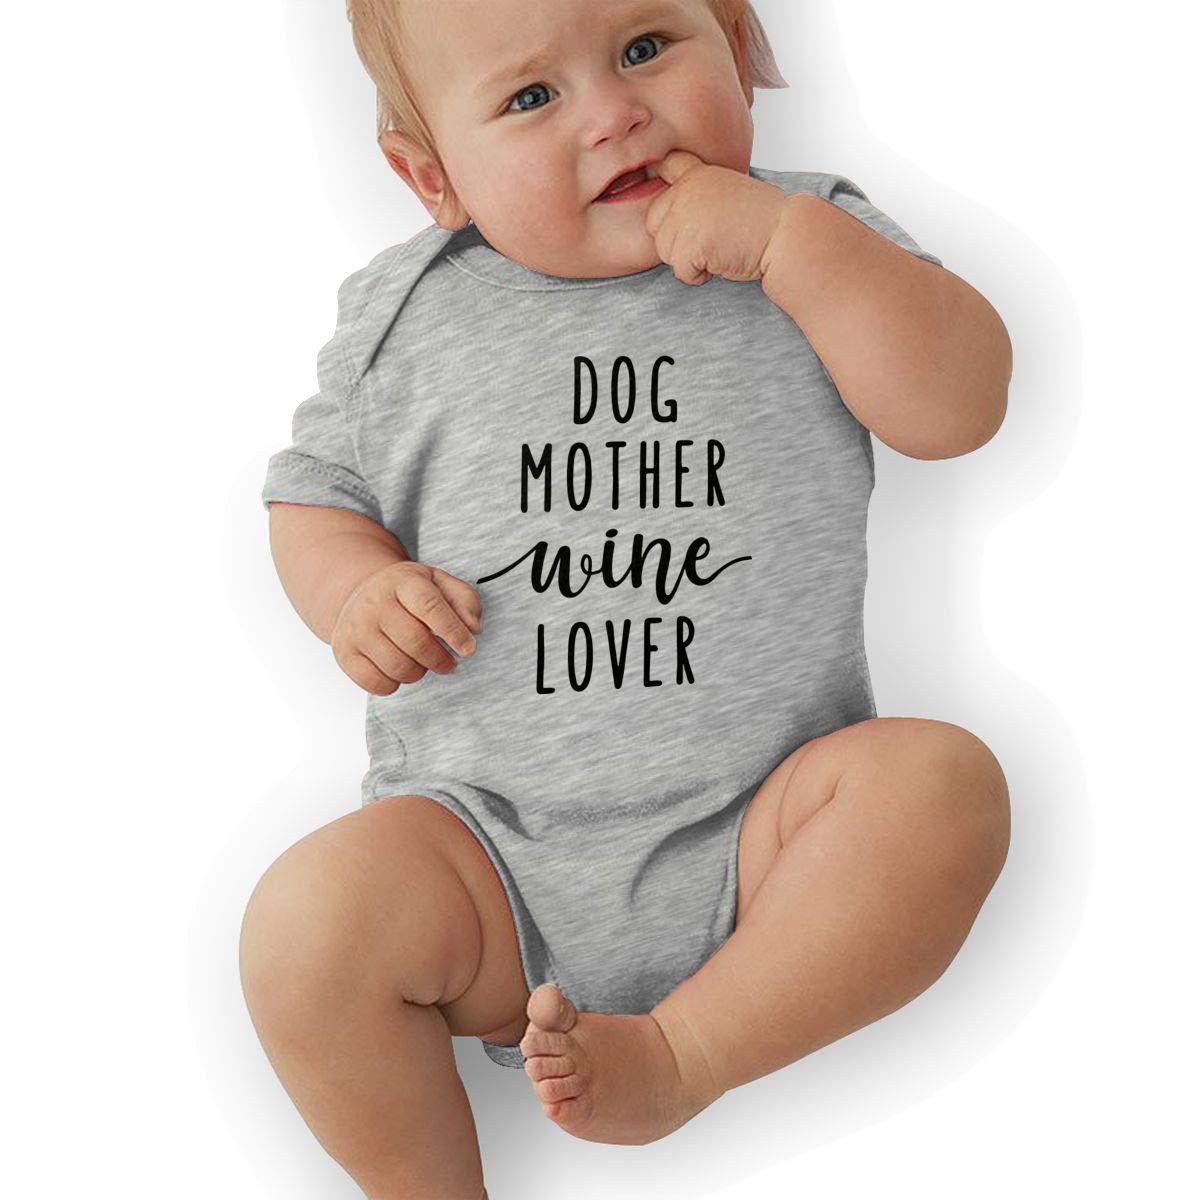 Dog Mother Wine Lover Infant Baby Girl Boy Romper Jumpsuit Short Sleeve Bodysuit Tops Clothes